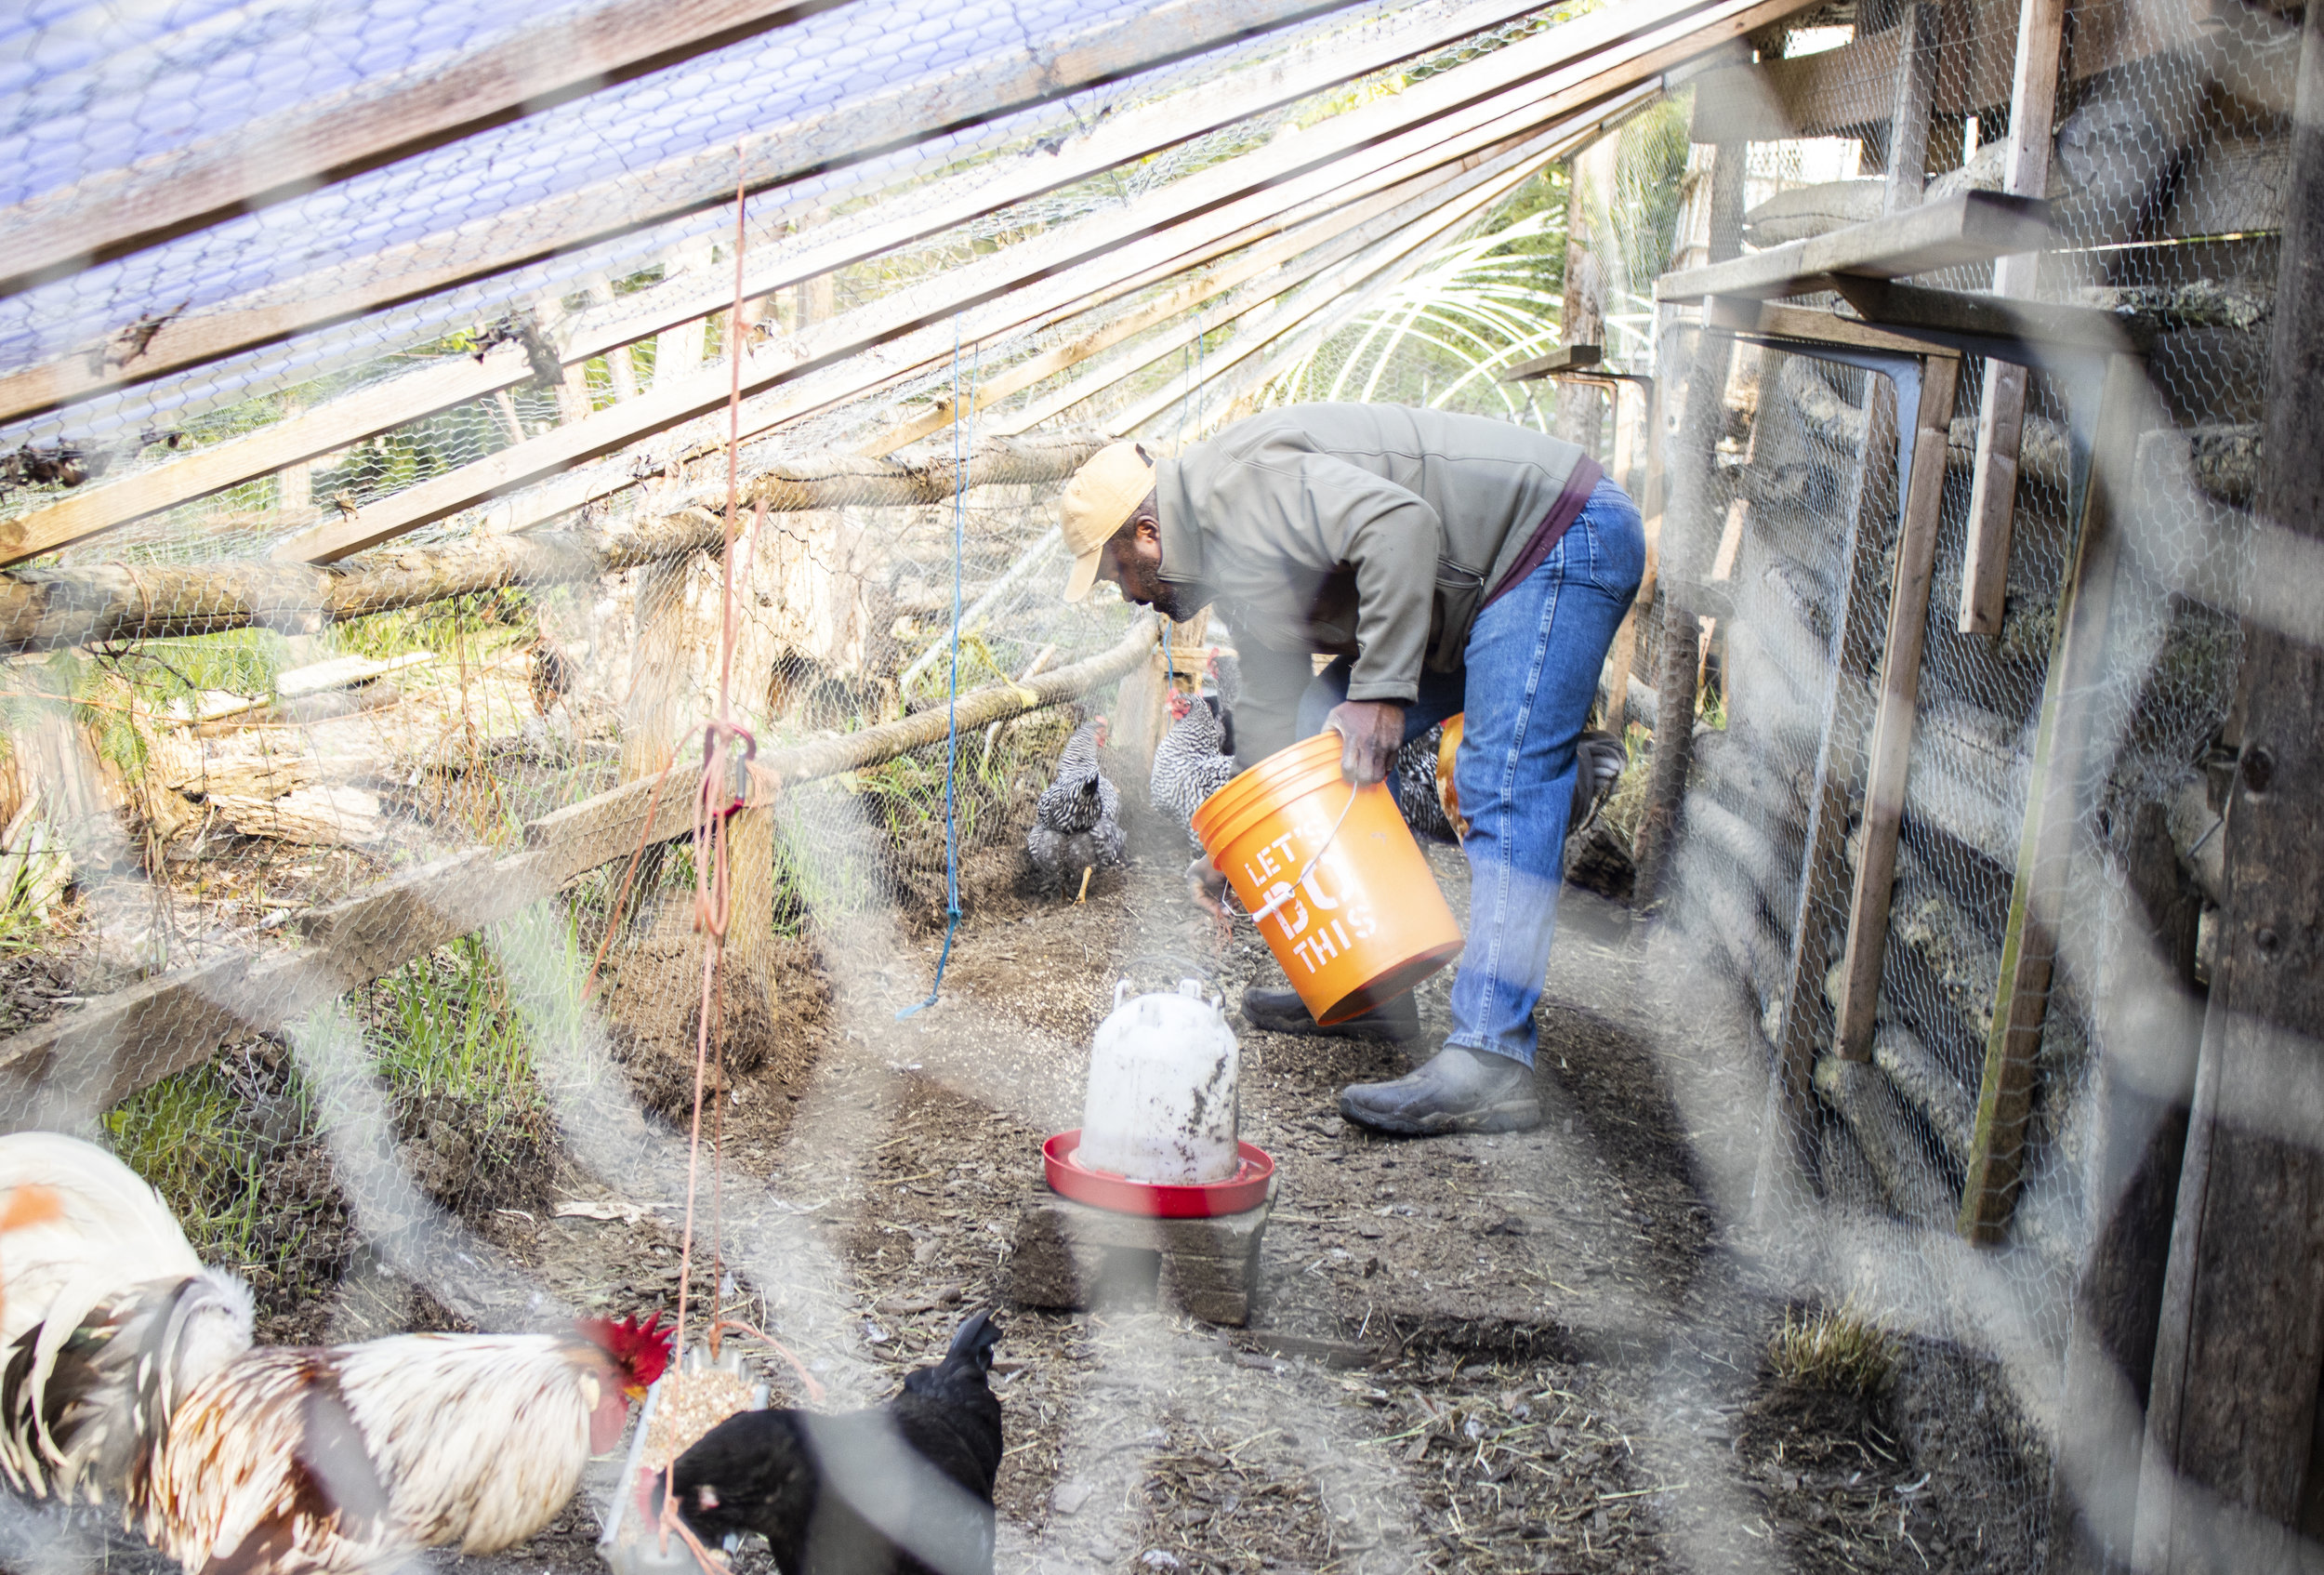 Rohn feeding chickens.